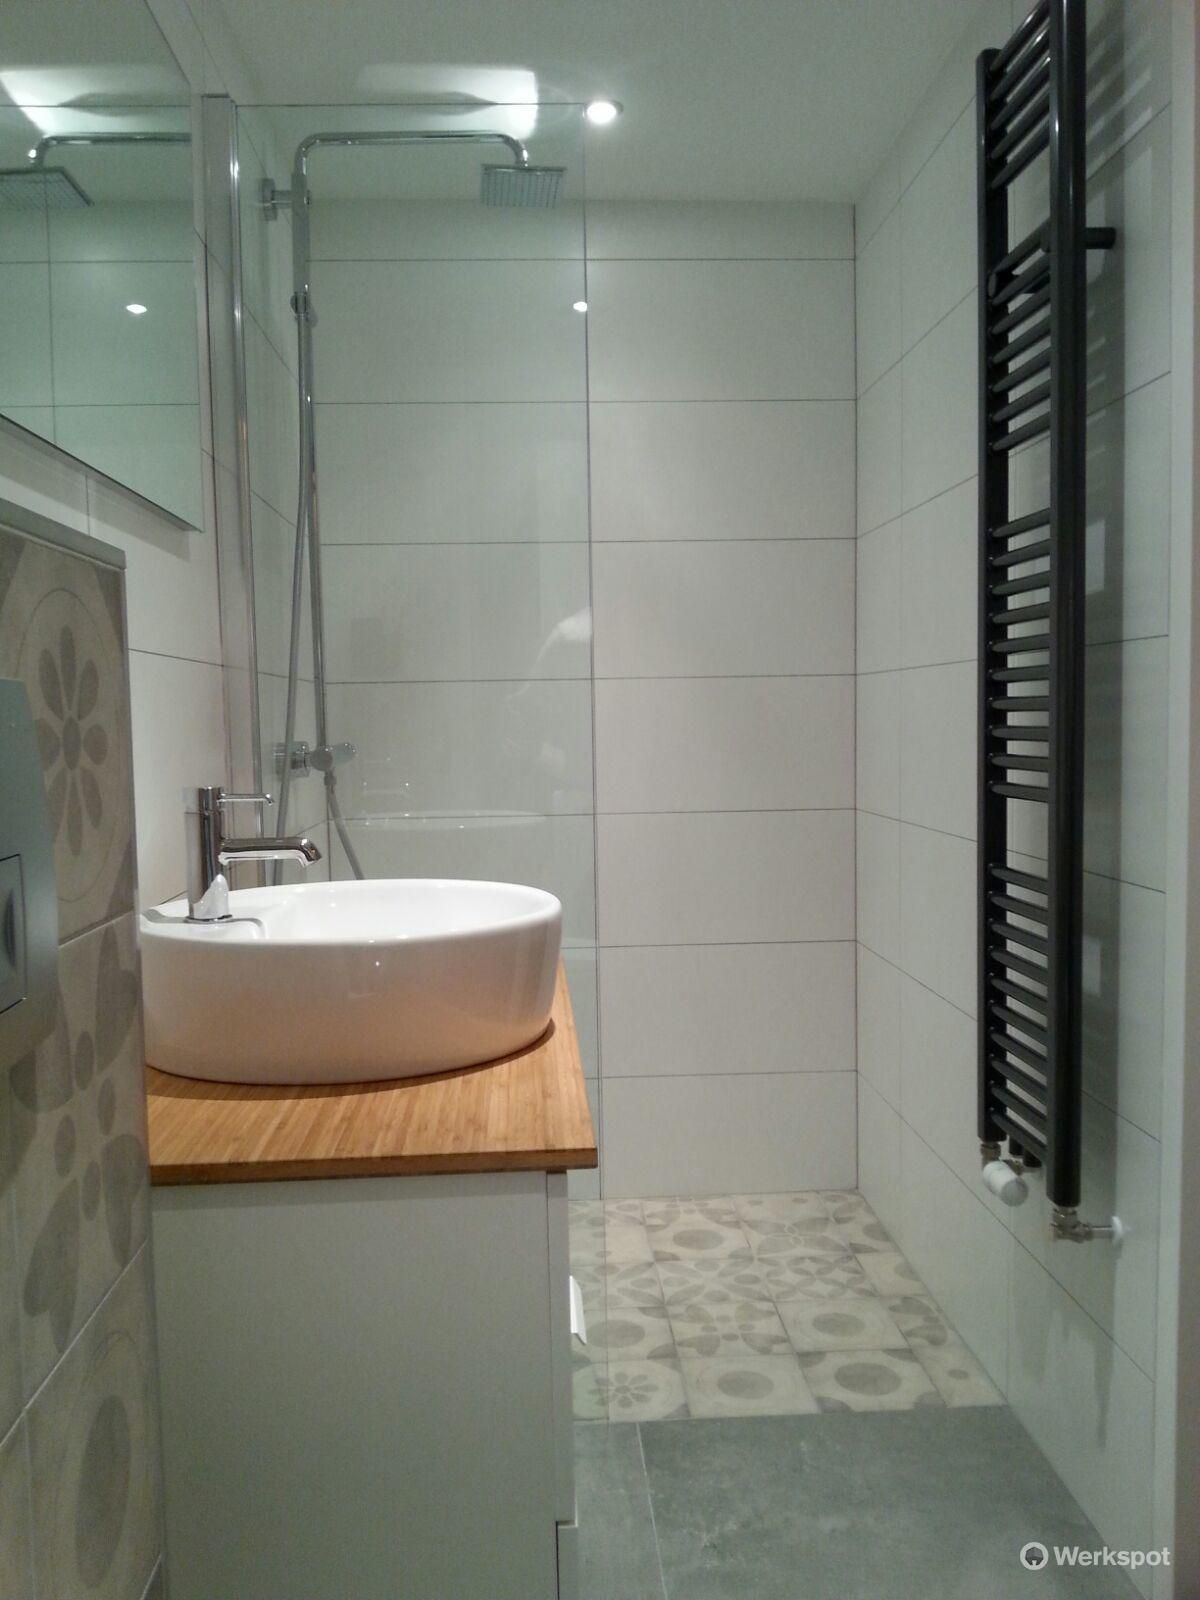 Renovatie kleine badkamer (3,70L*1,20B*2,60H) - Werkspot | Badkamer ...